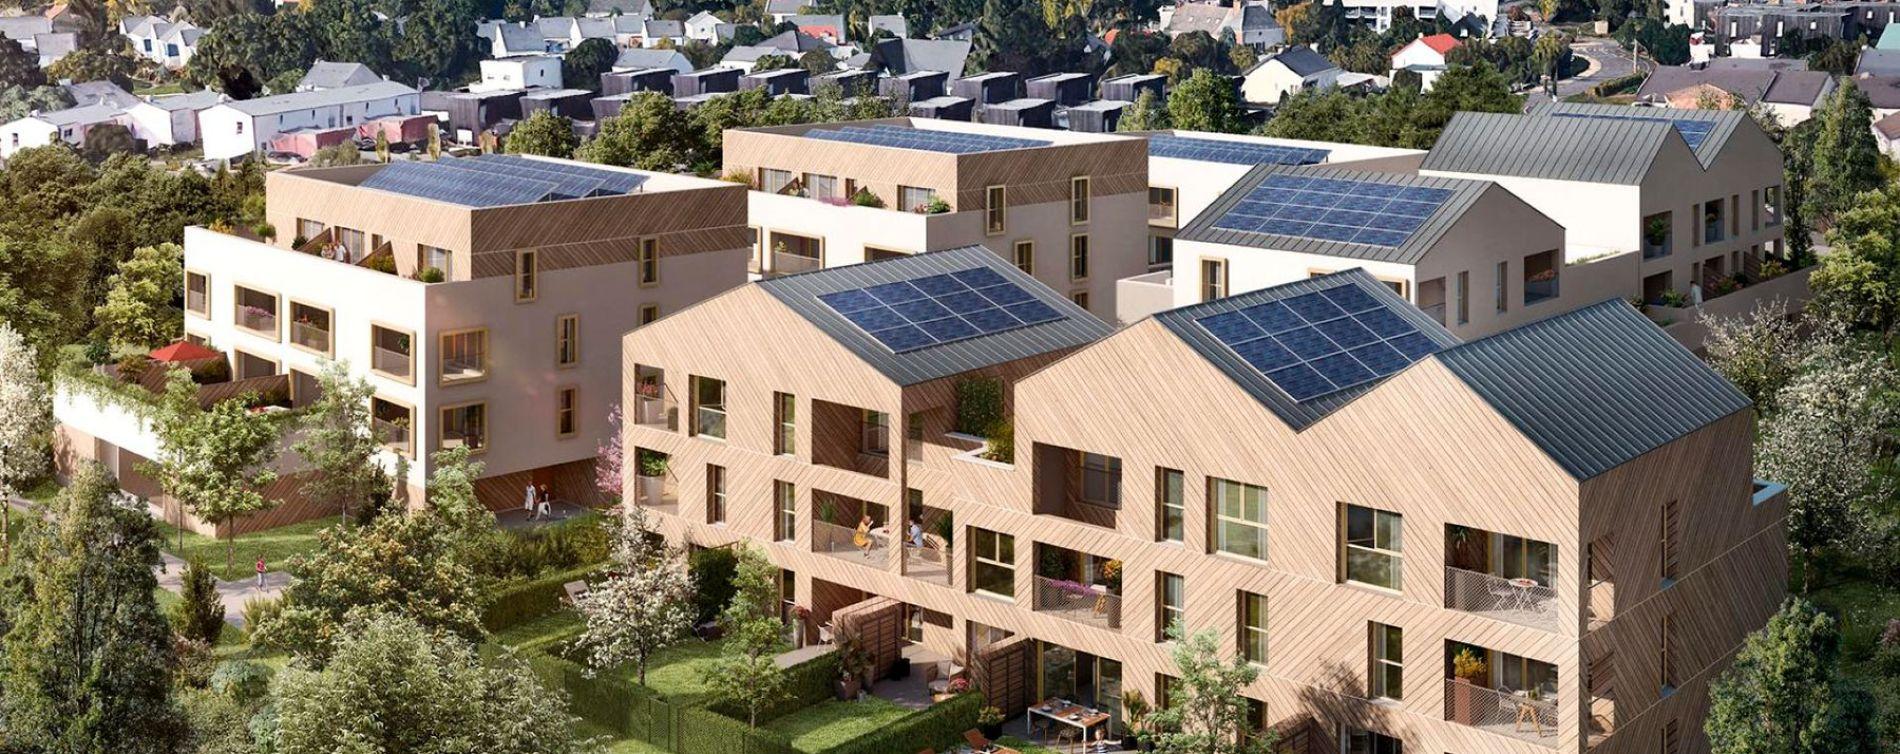 Couëron : programme immobilier neuve « Programme immobilier n°215071 » (2)